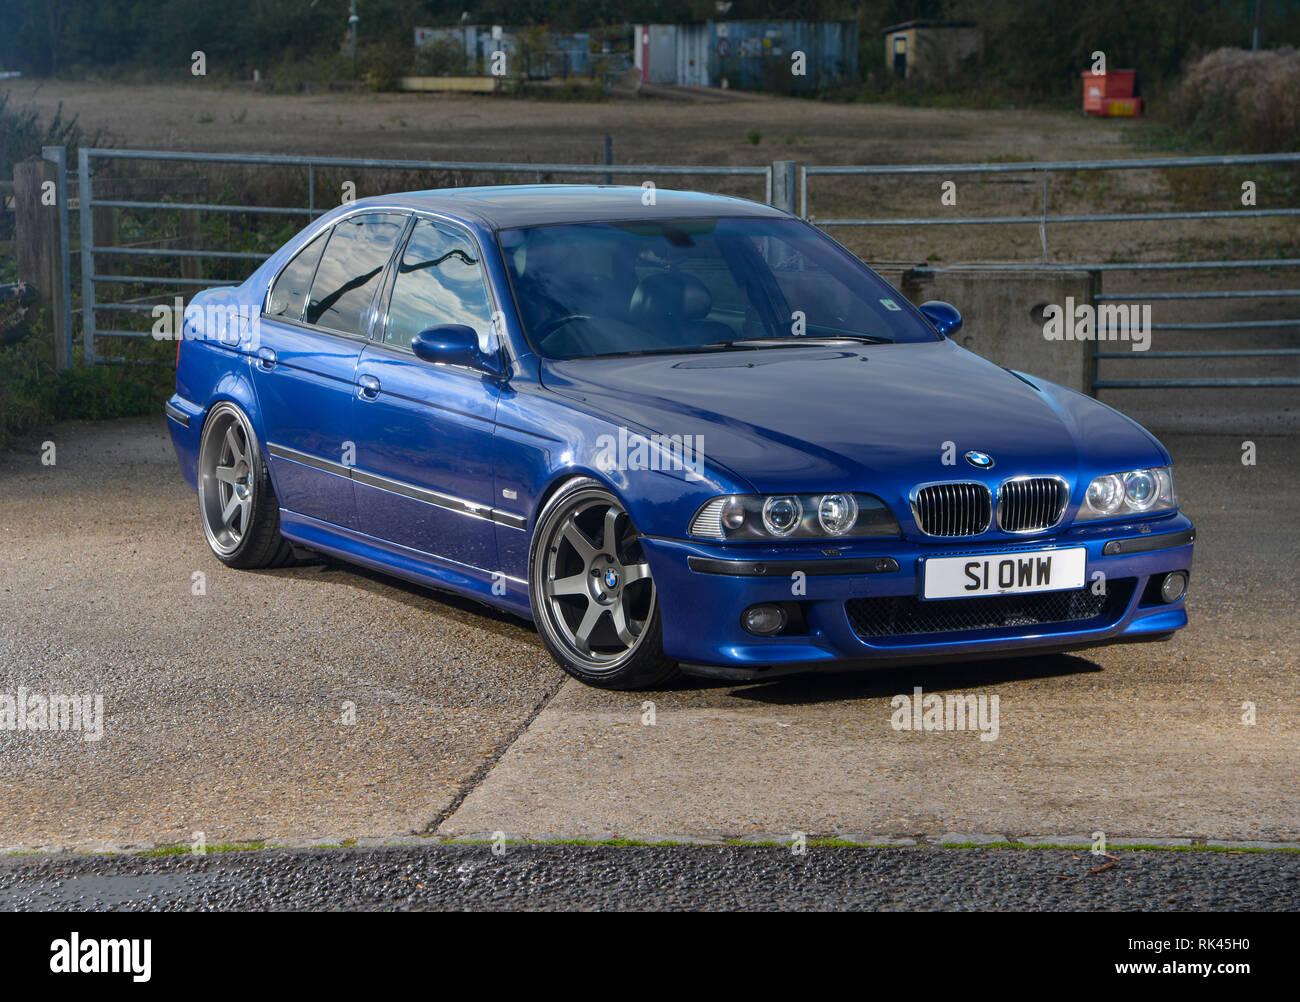 BMW E39 M5 >> Bmw E39 M5 Super Saloon Modern Classic German Car Stock